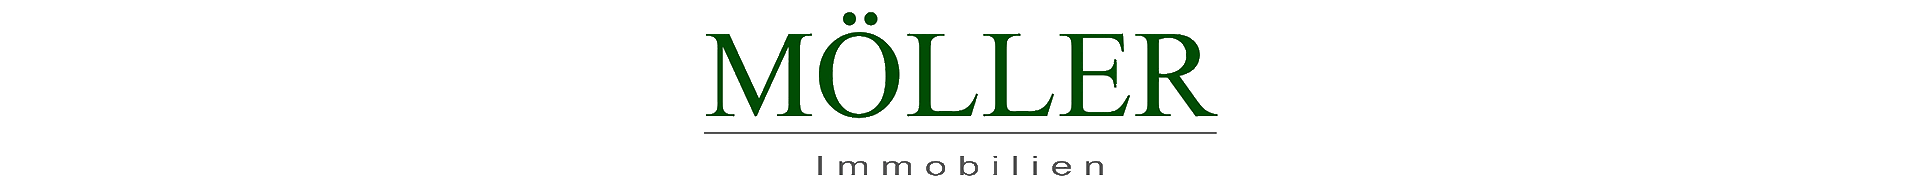 logo-möller-immobilien-datteln